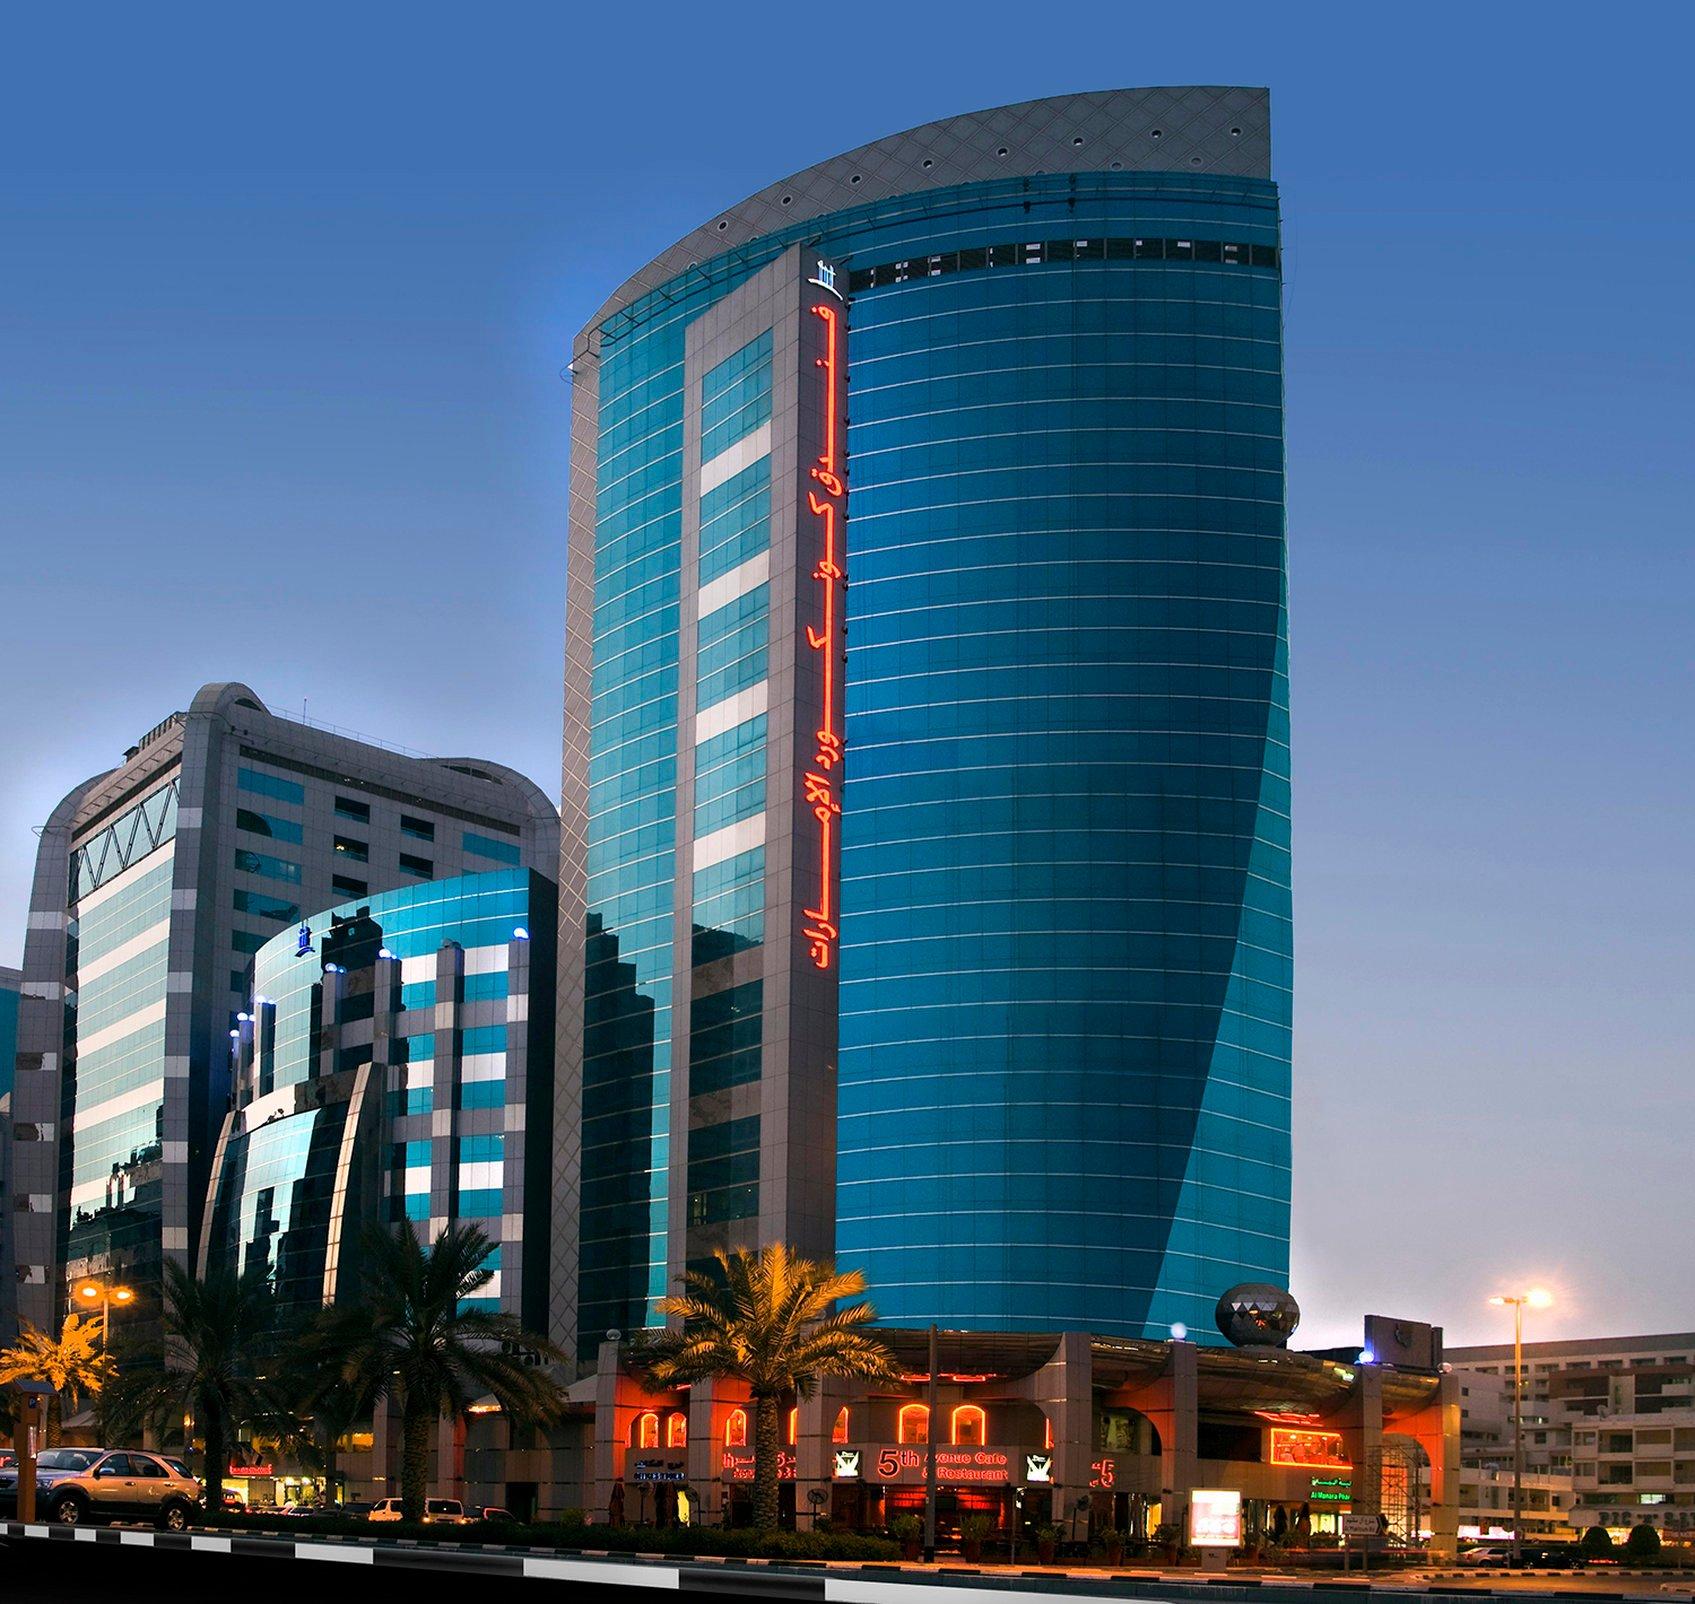 Emirates Concorde Hotel & Residence